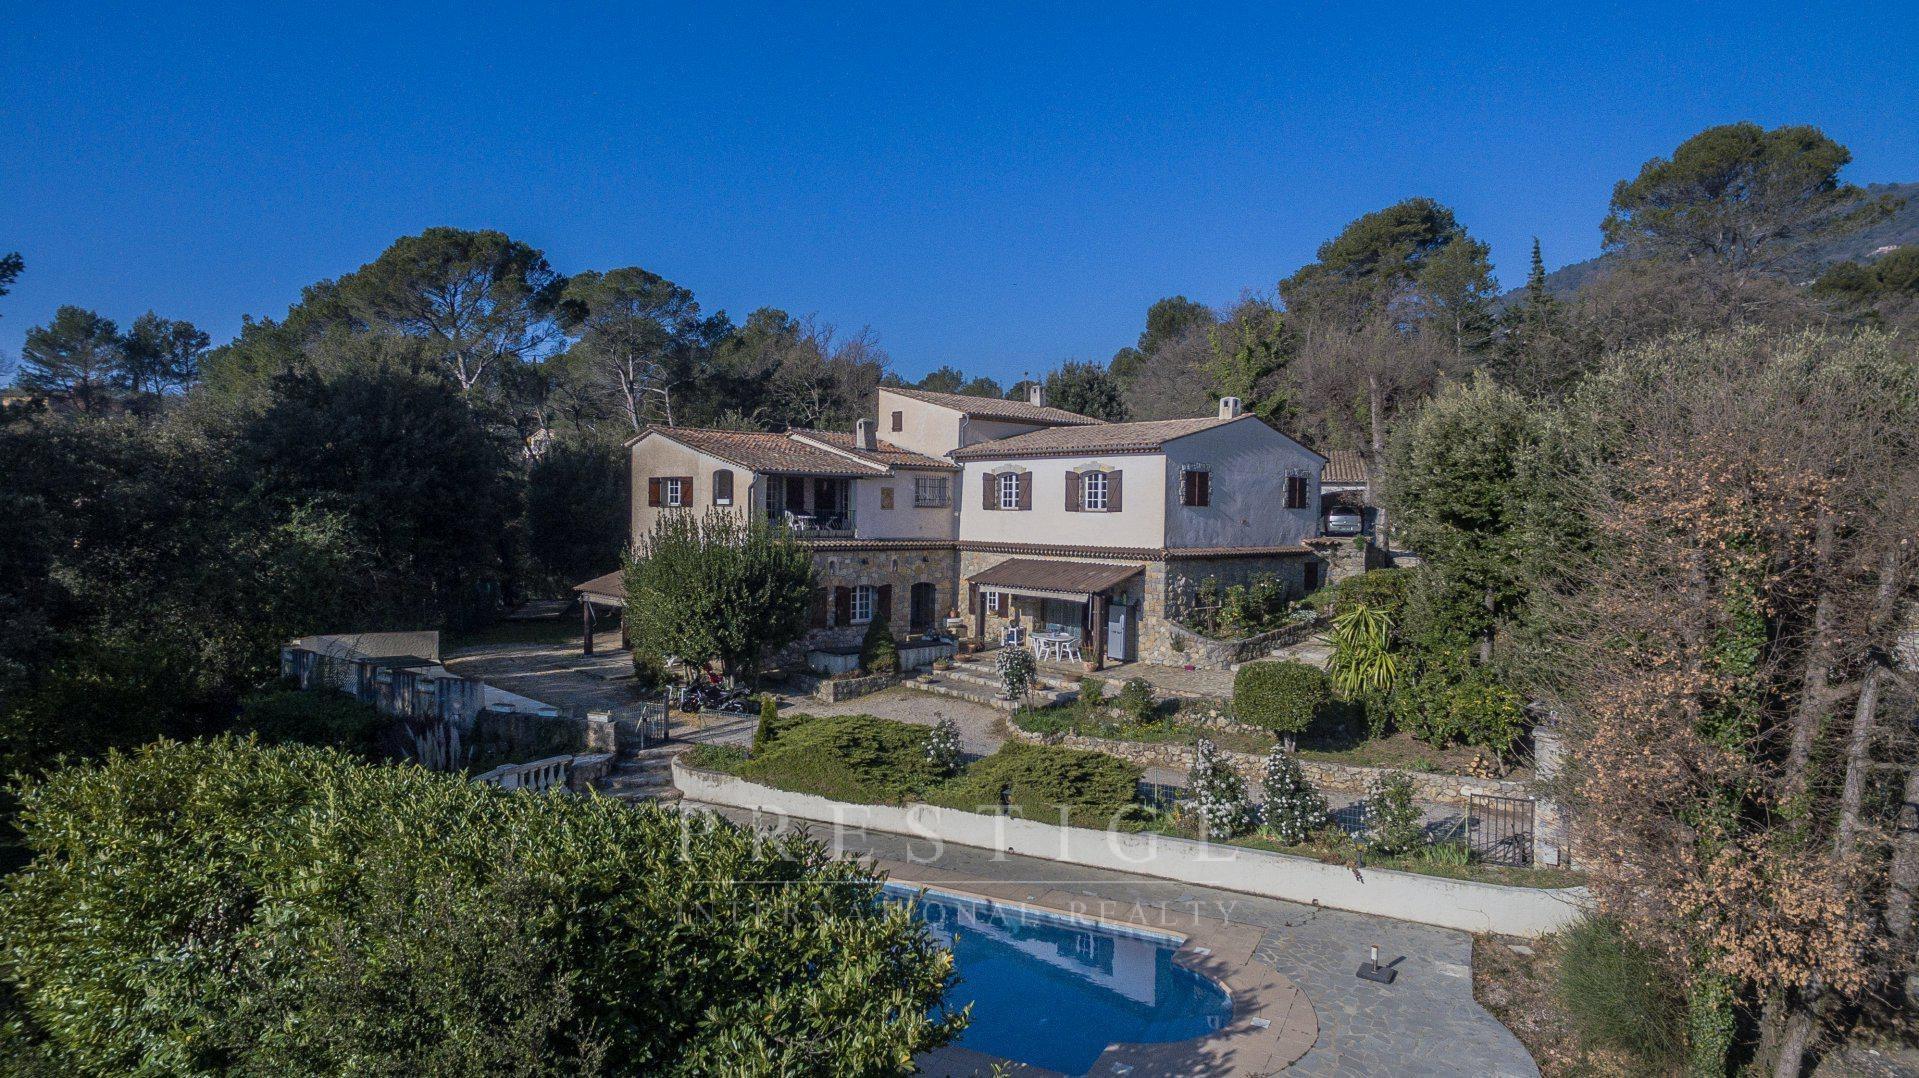 House in Spéracèdes, Provence-Alpes-Côte d'Azur, France 1